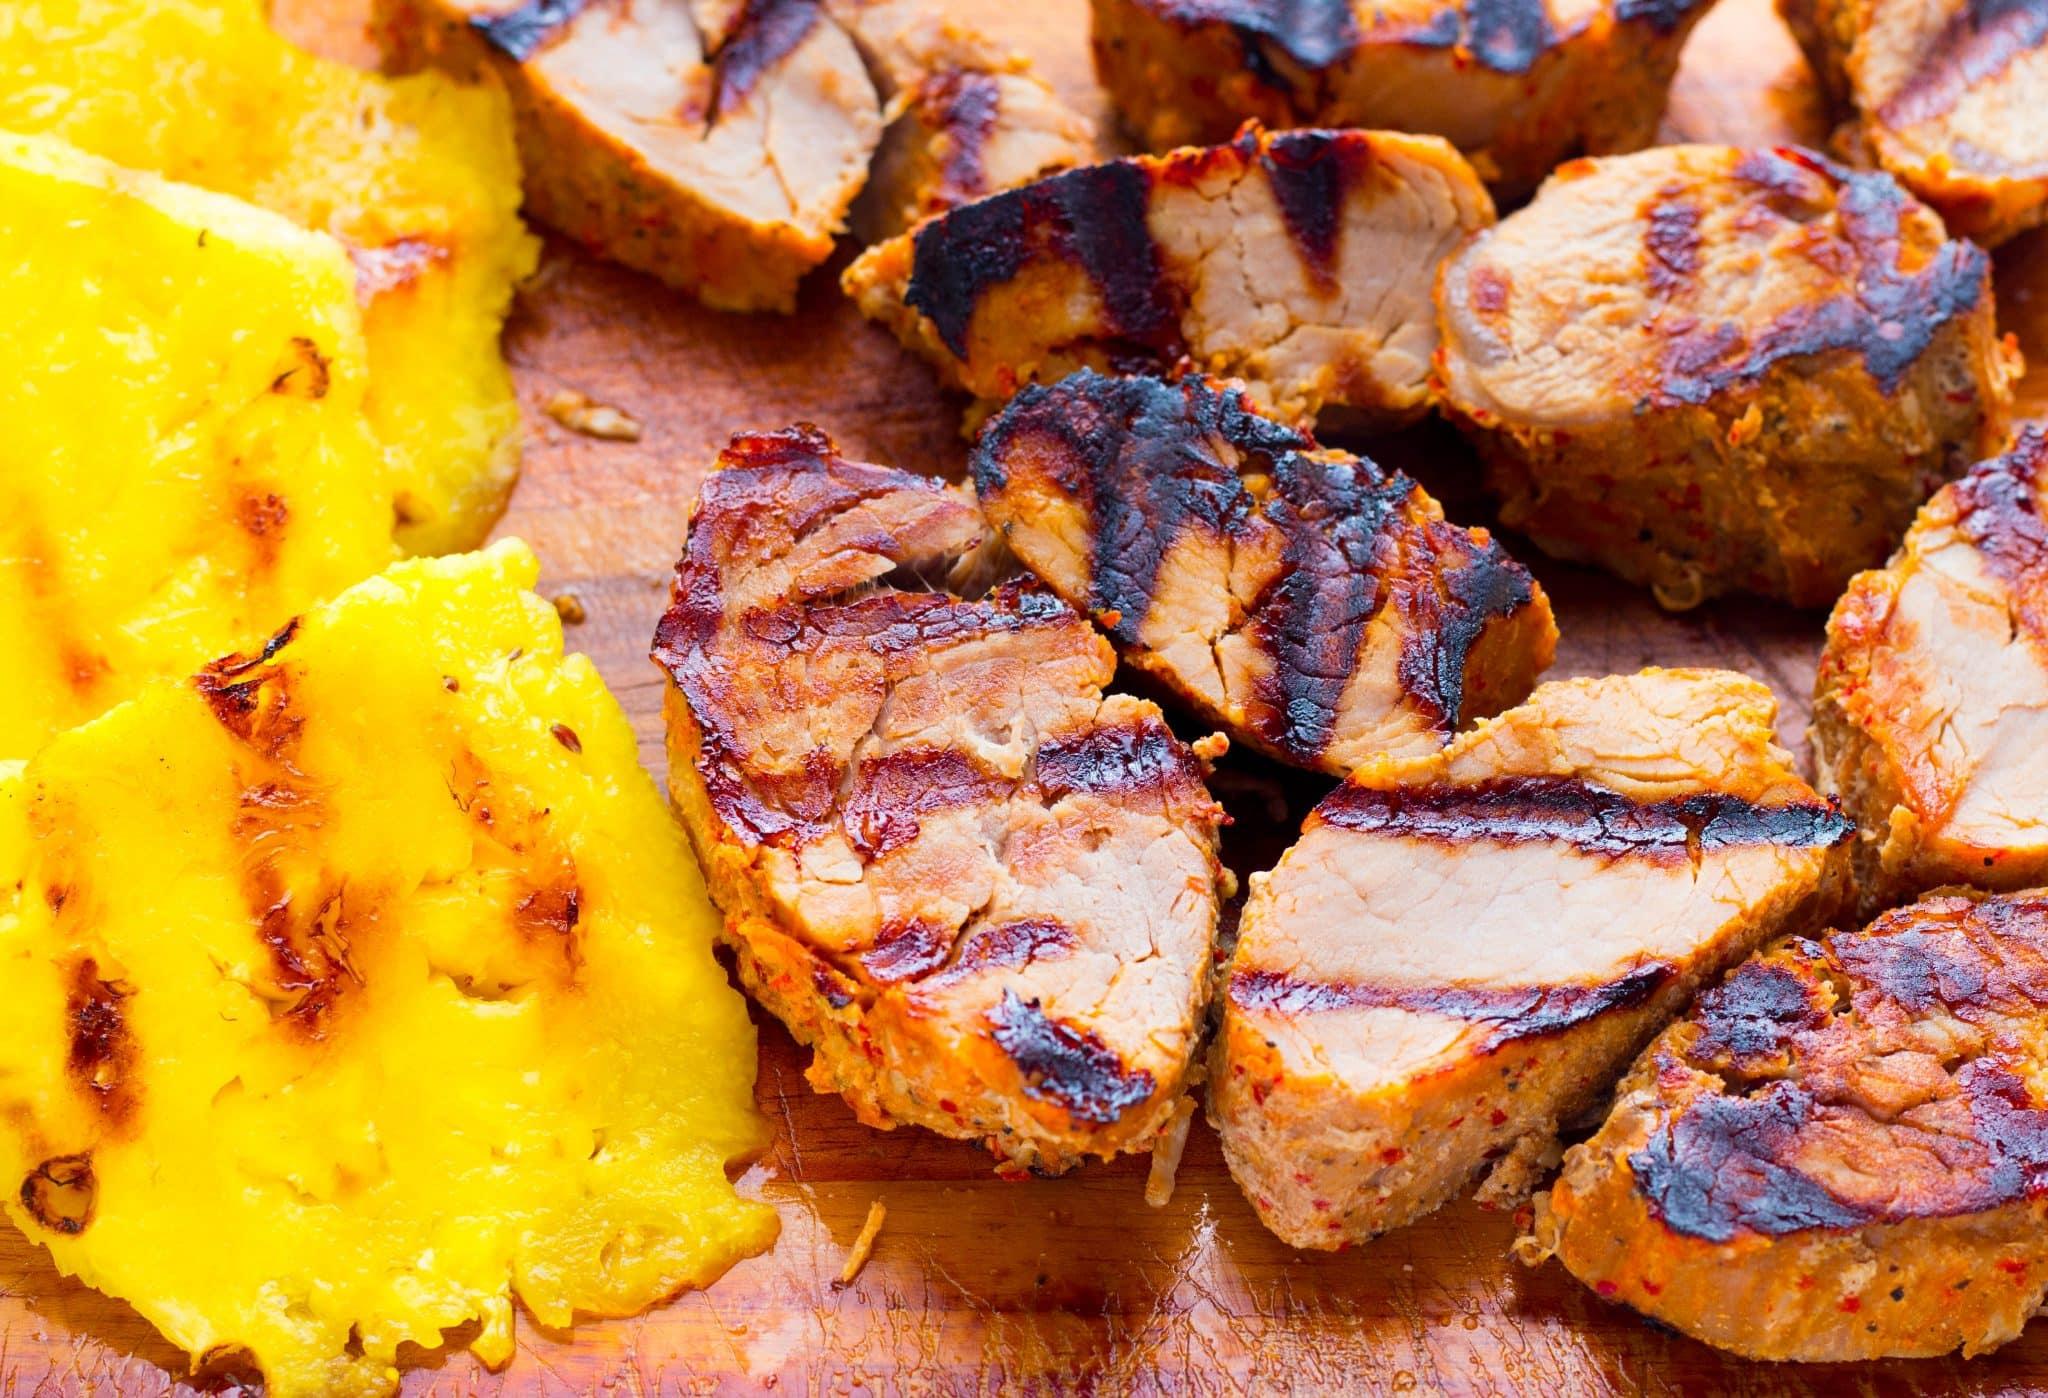 Grilled Pineapple Teriyaki Pork Sandwiches